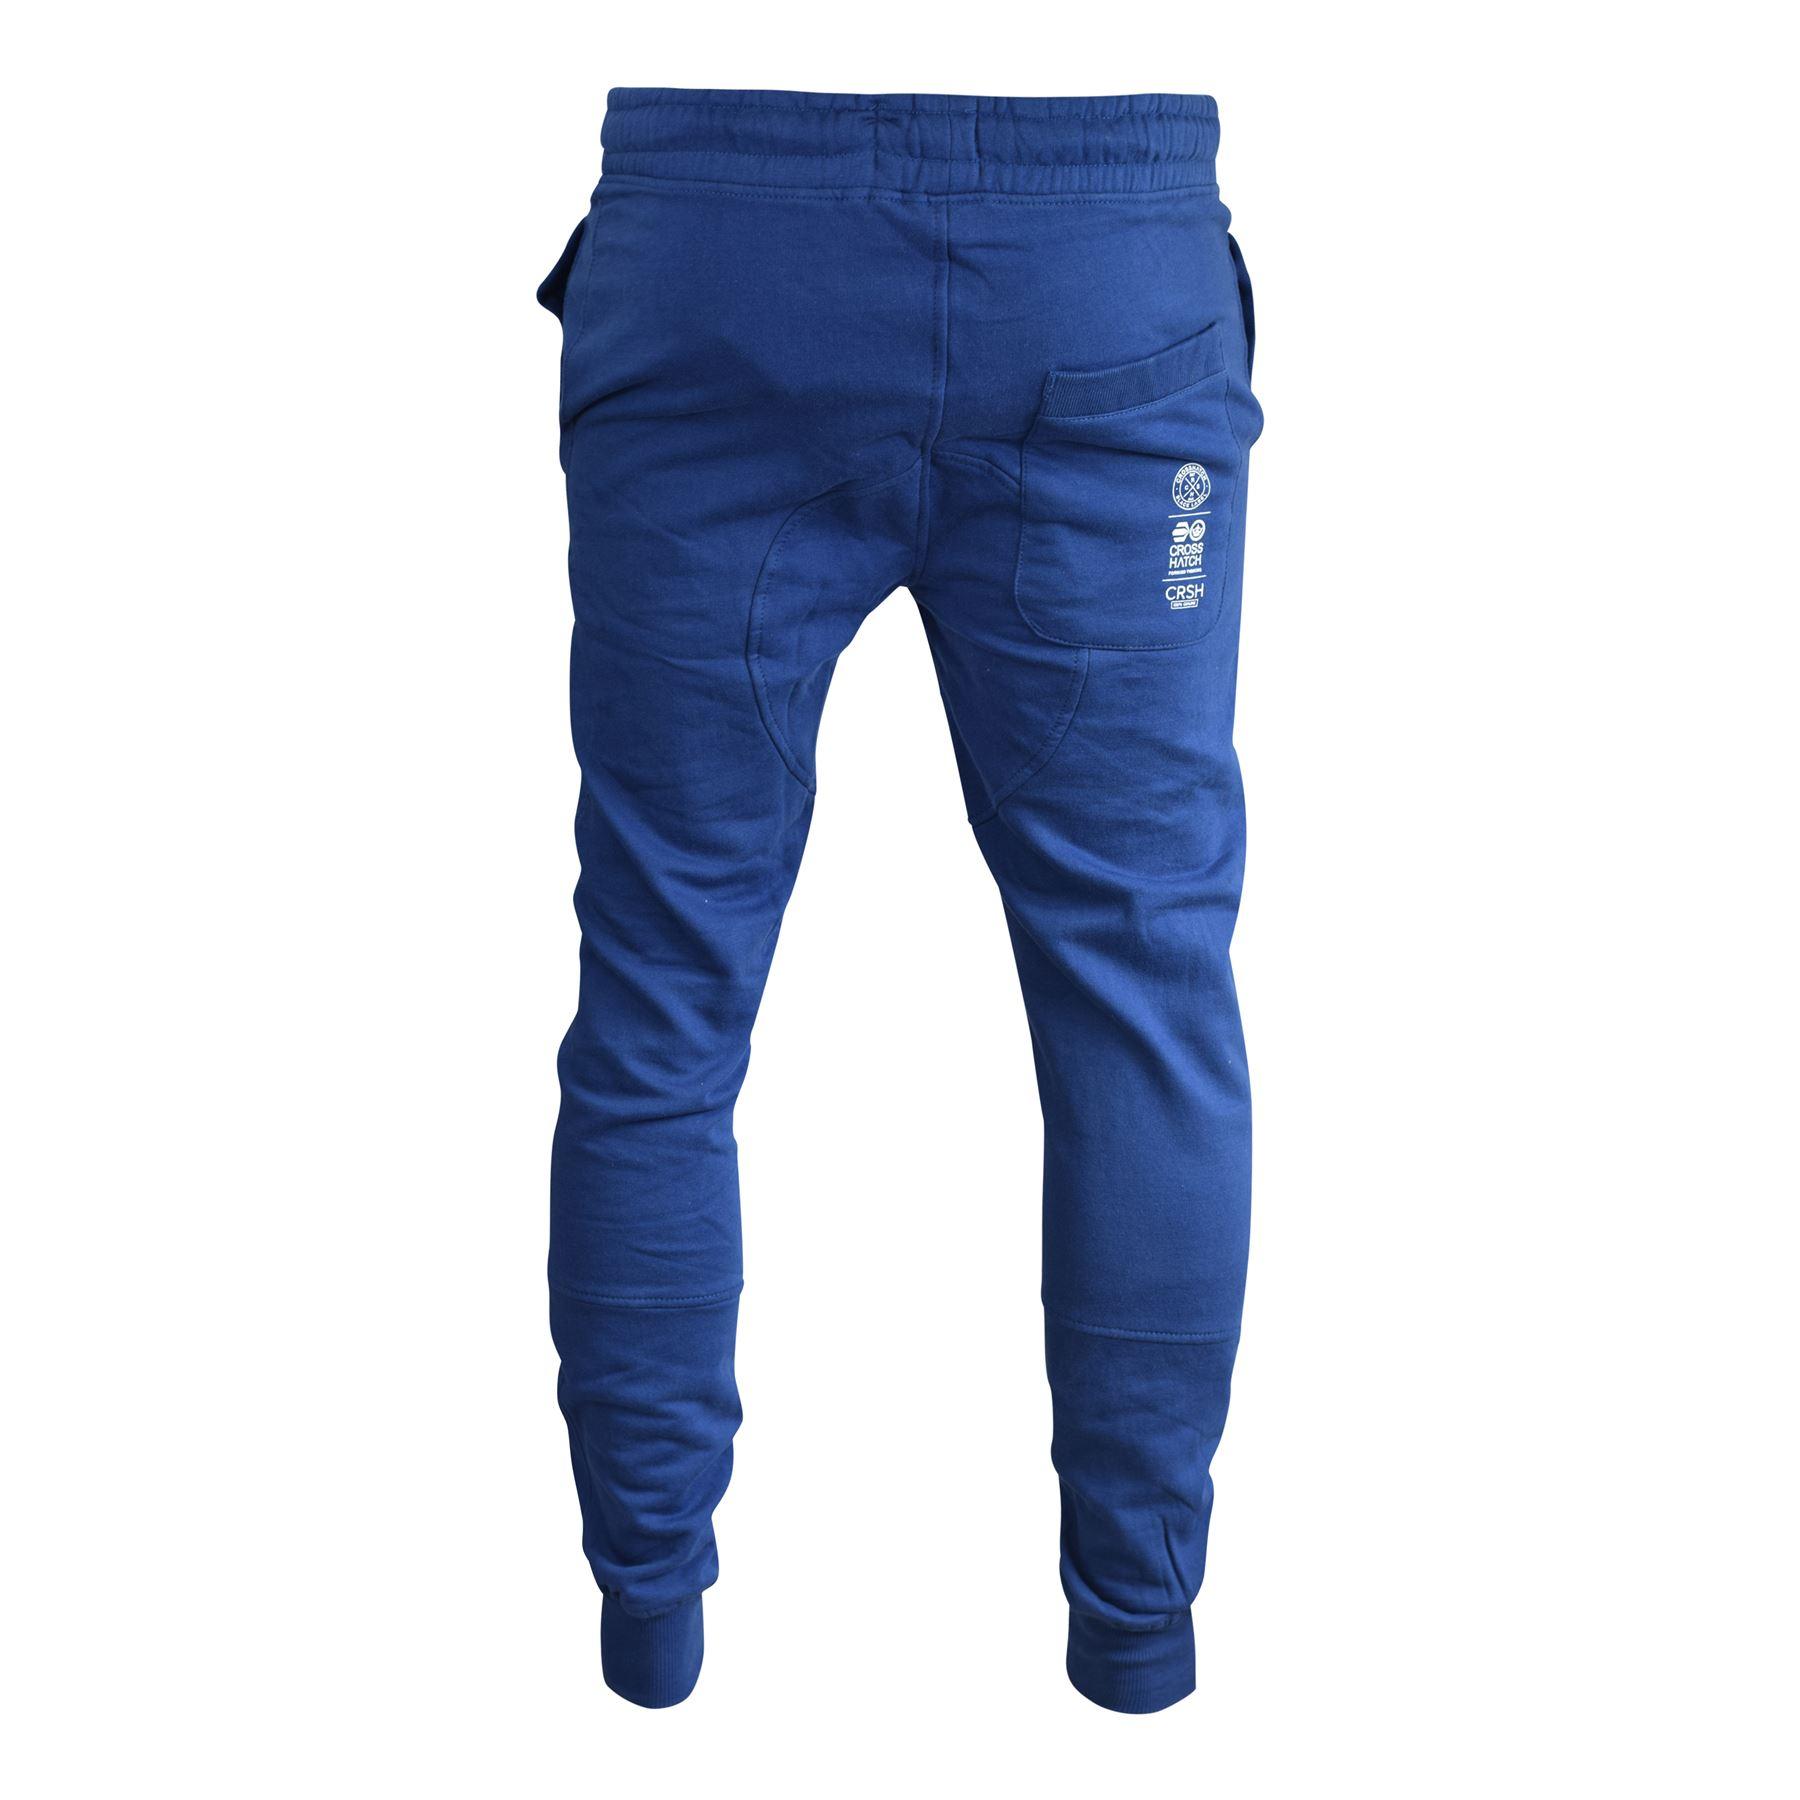 Para-Hombre-Pantalones-Basculador-Crosshatch-shacka-Flaca-Delgada-Chandal-Correr-Pantalones miniatura 11